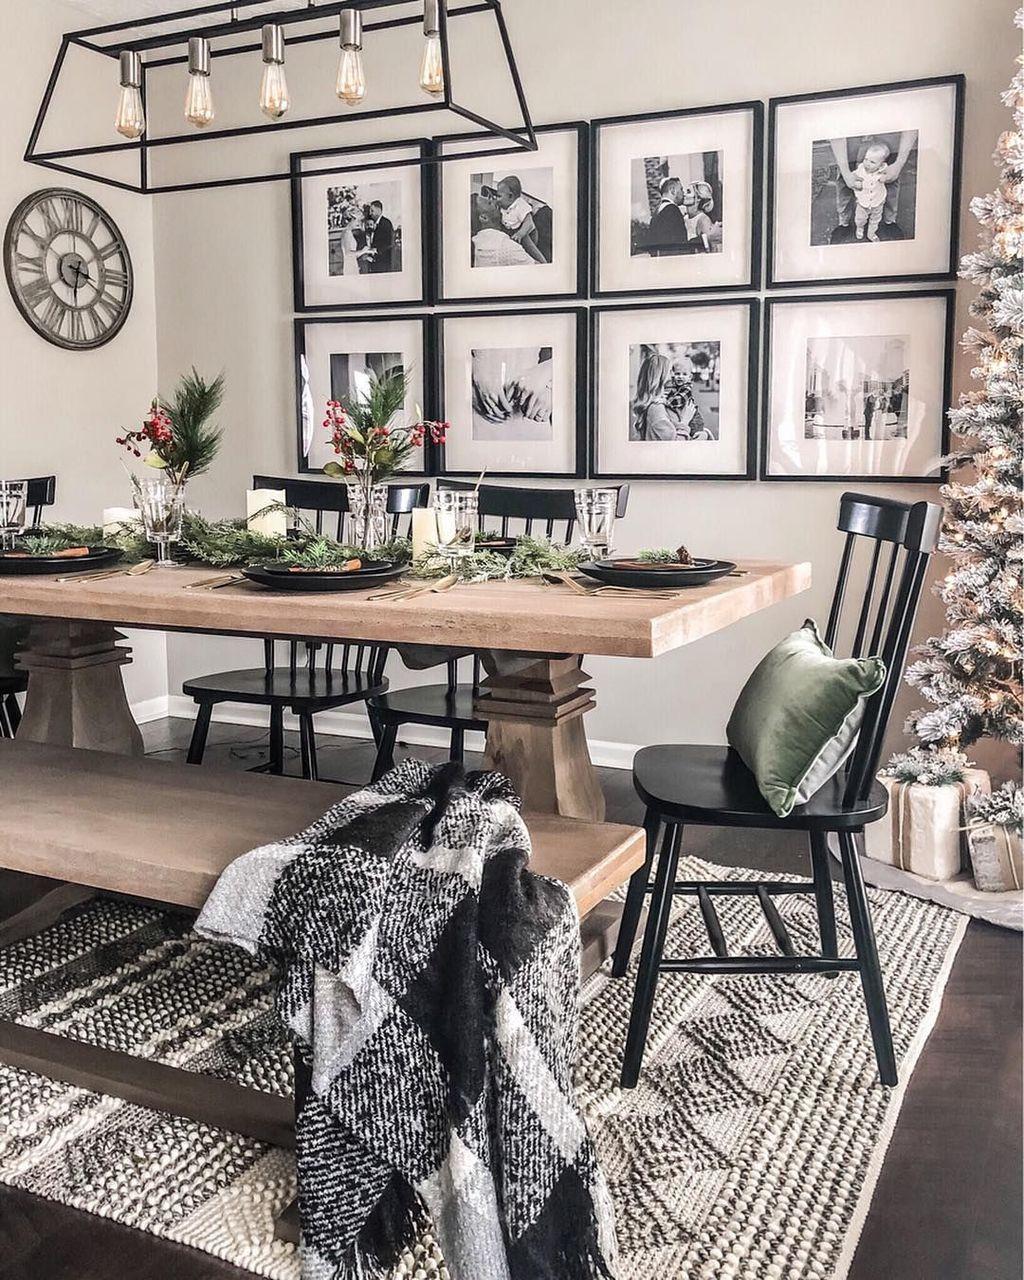 42 Classy Black Dining Room Design Ideas